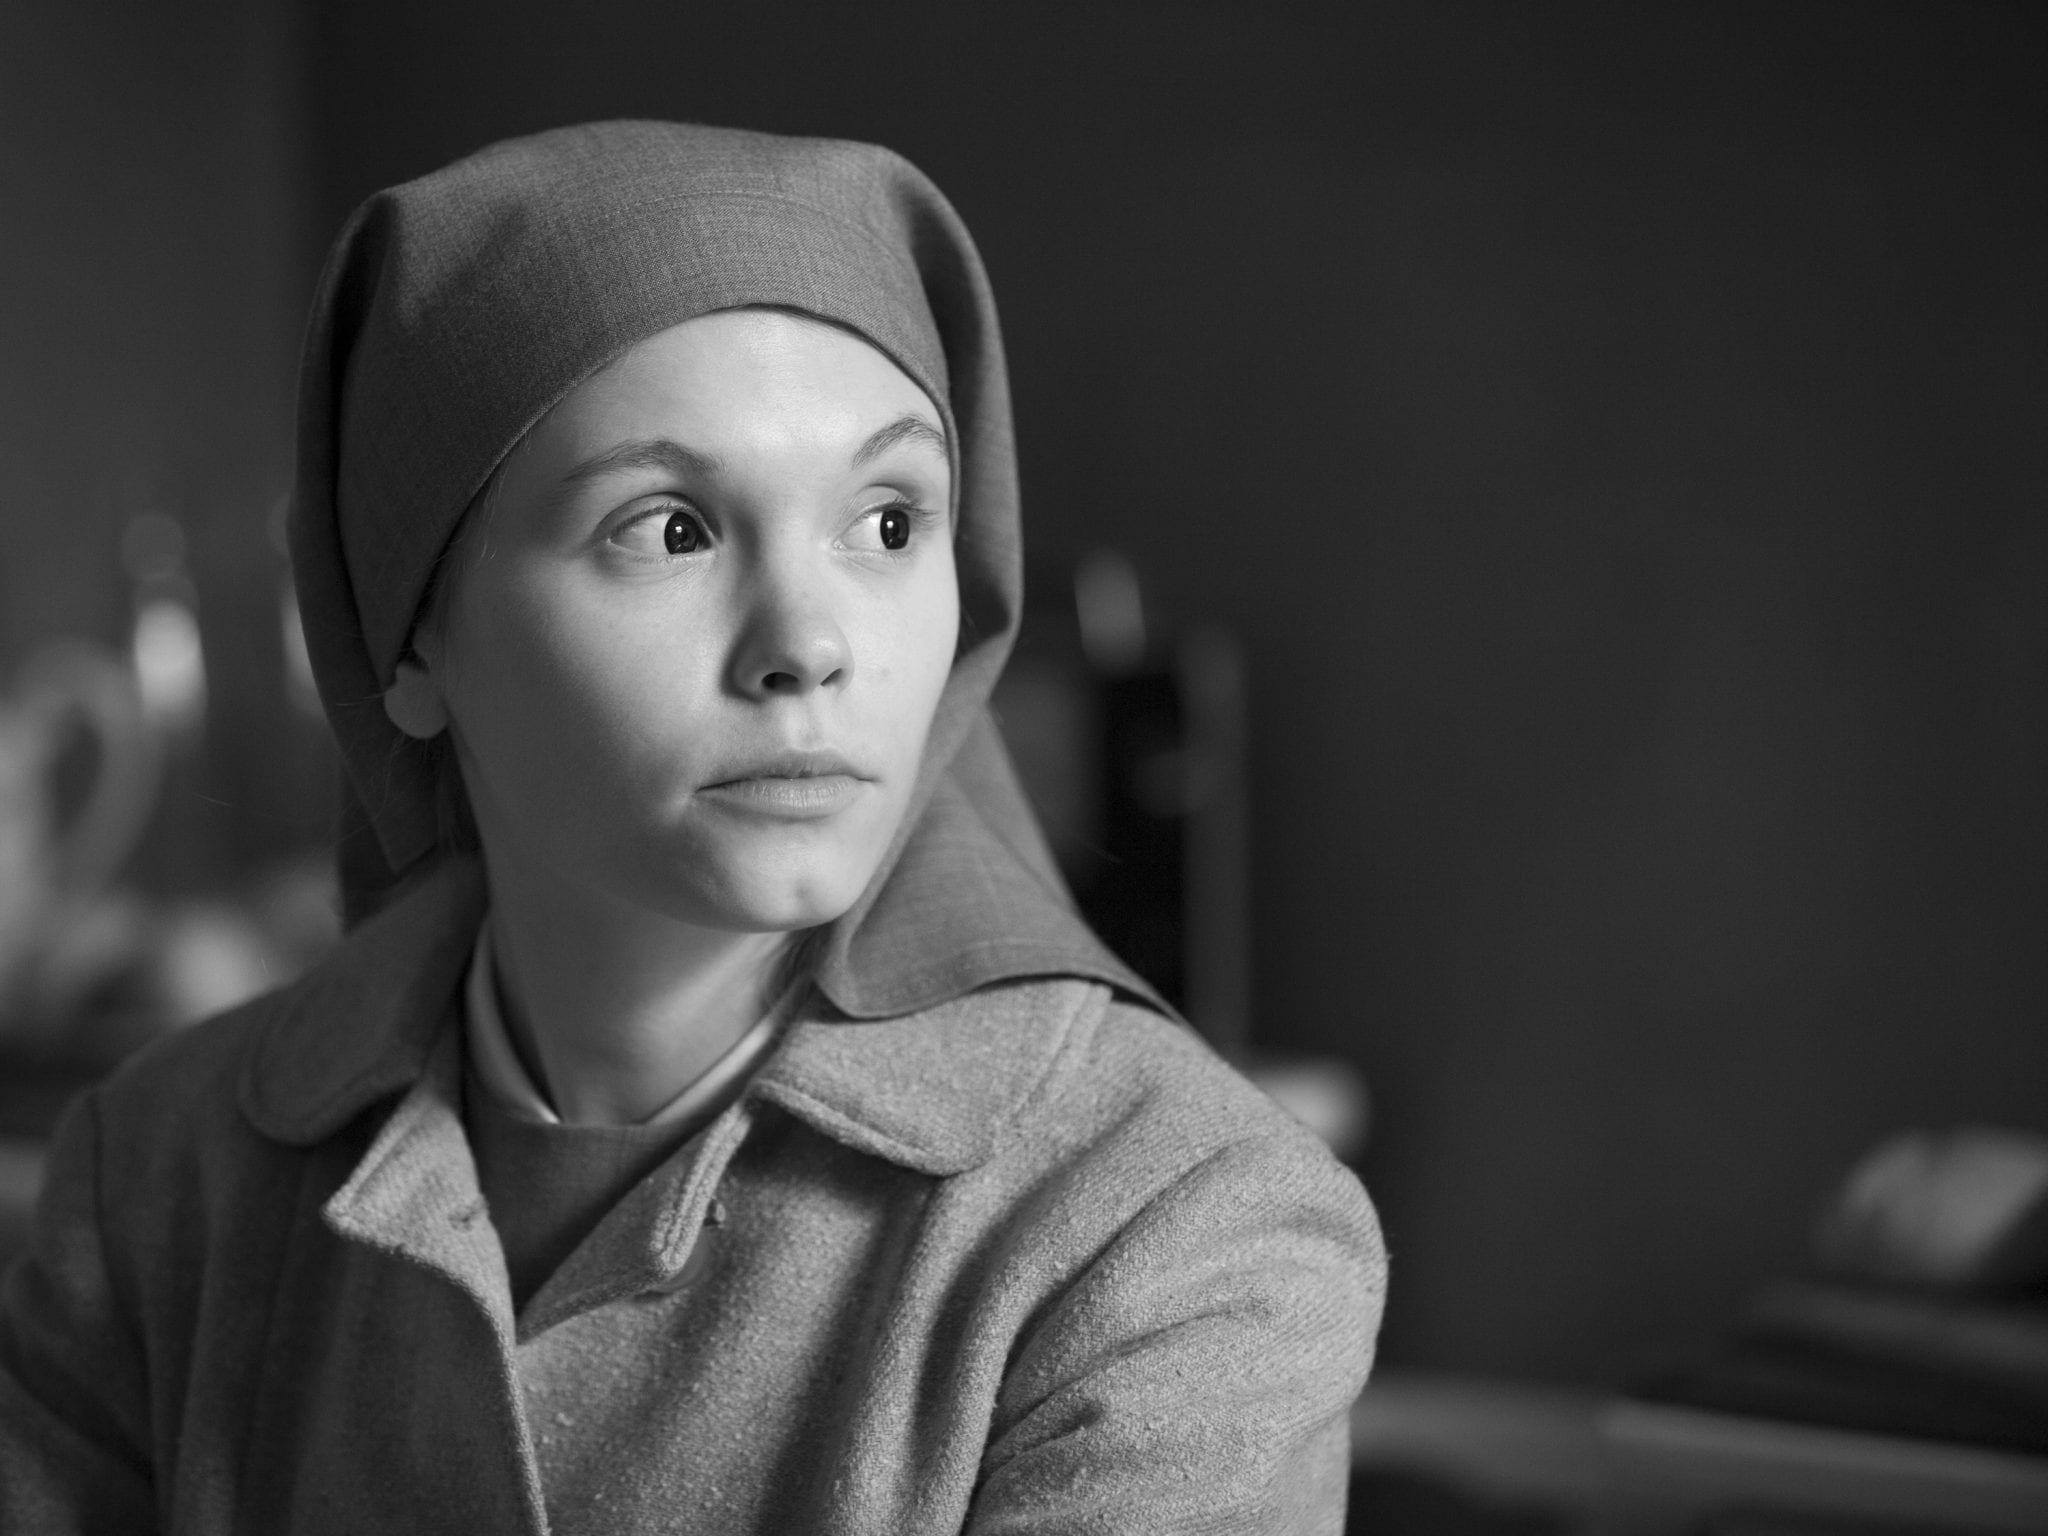 Ida, il nuovo film di Pawel Pawlikowski